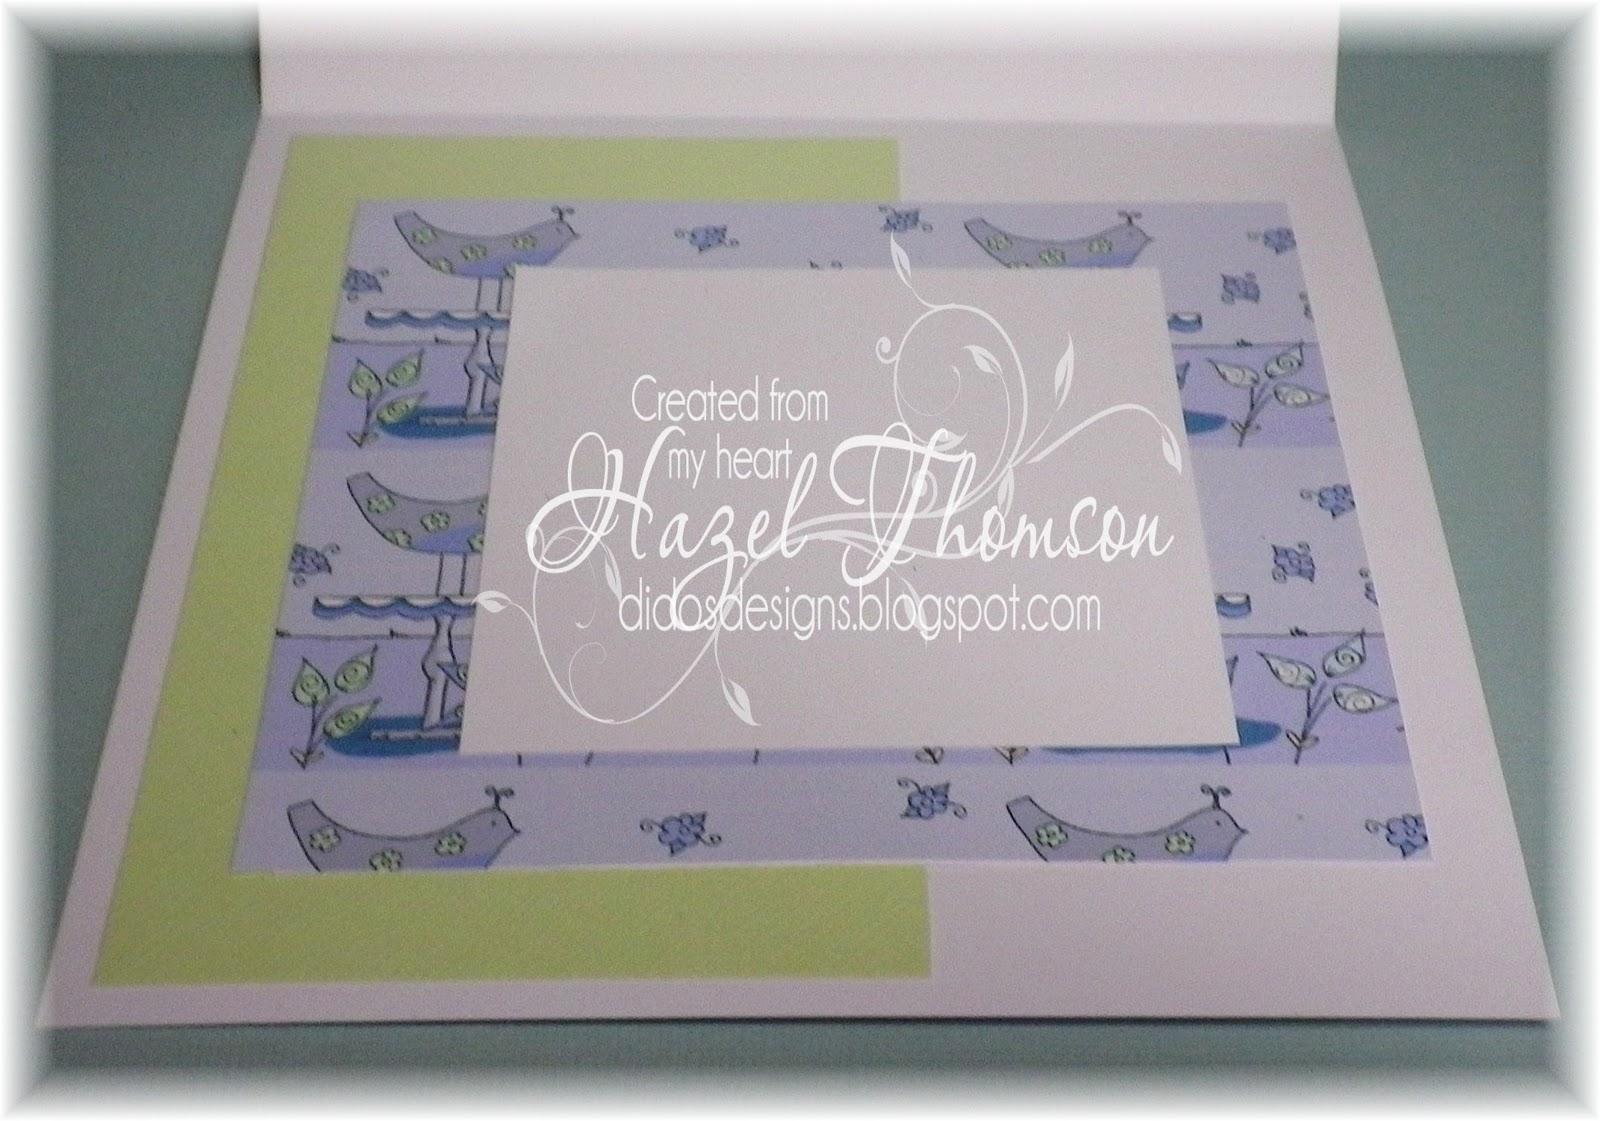 http://1.bp.blogspot.com/-2EswBeZrFh4/Tx761Kj_pKI/AAAAAAAAGUM/o-snicjEyaw/s1600/Cards+By+Dido%2527s+Designs+006.JPG